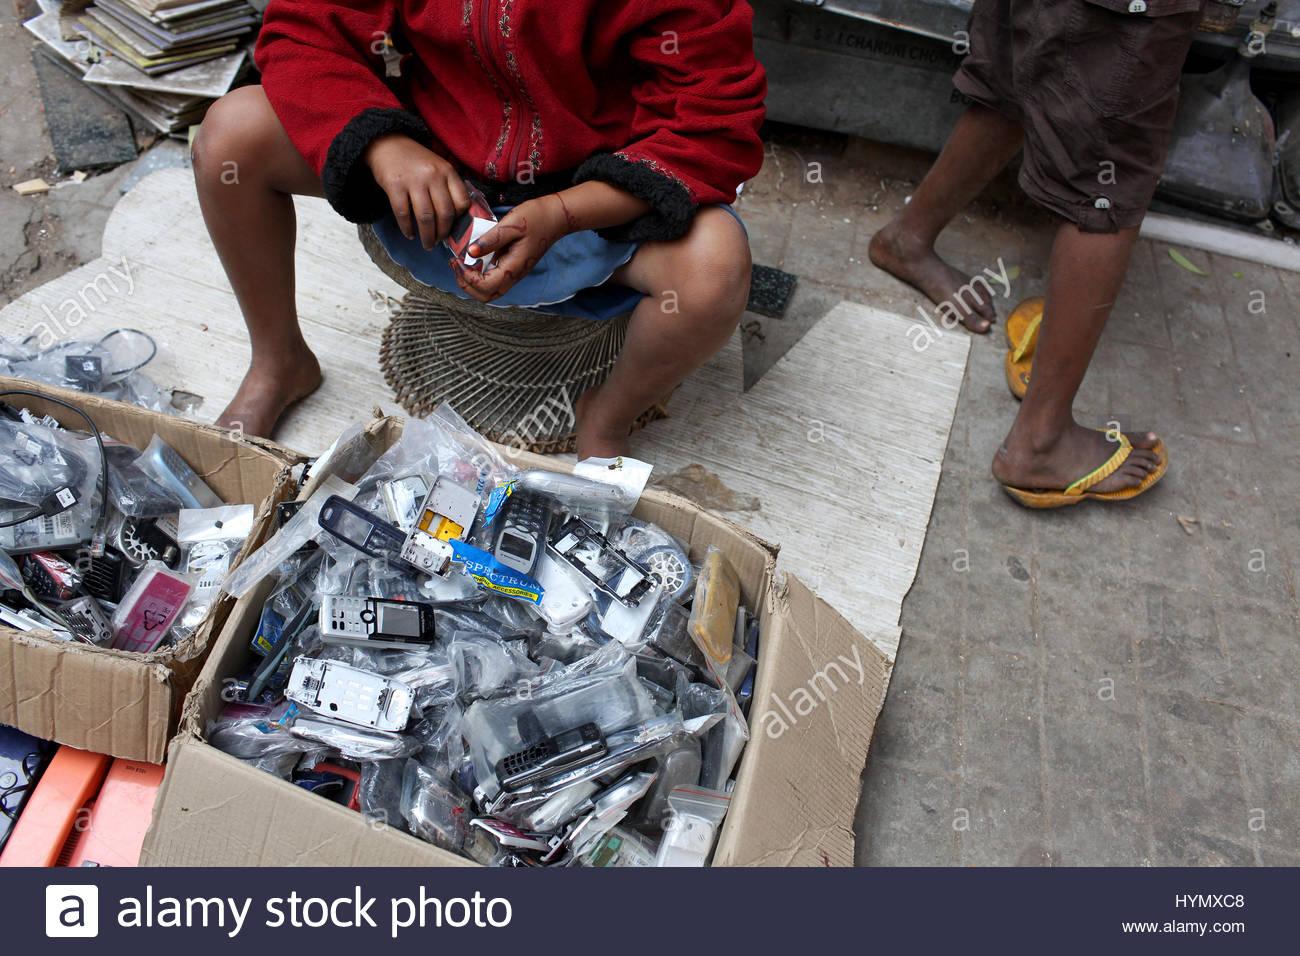 Electronic Goods Stock Photos & Electronic Goods Stock